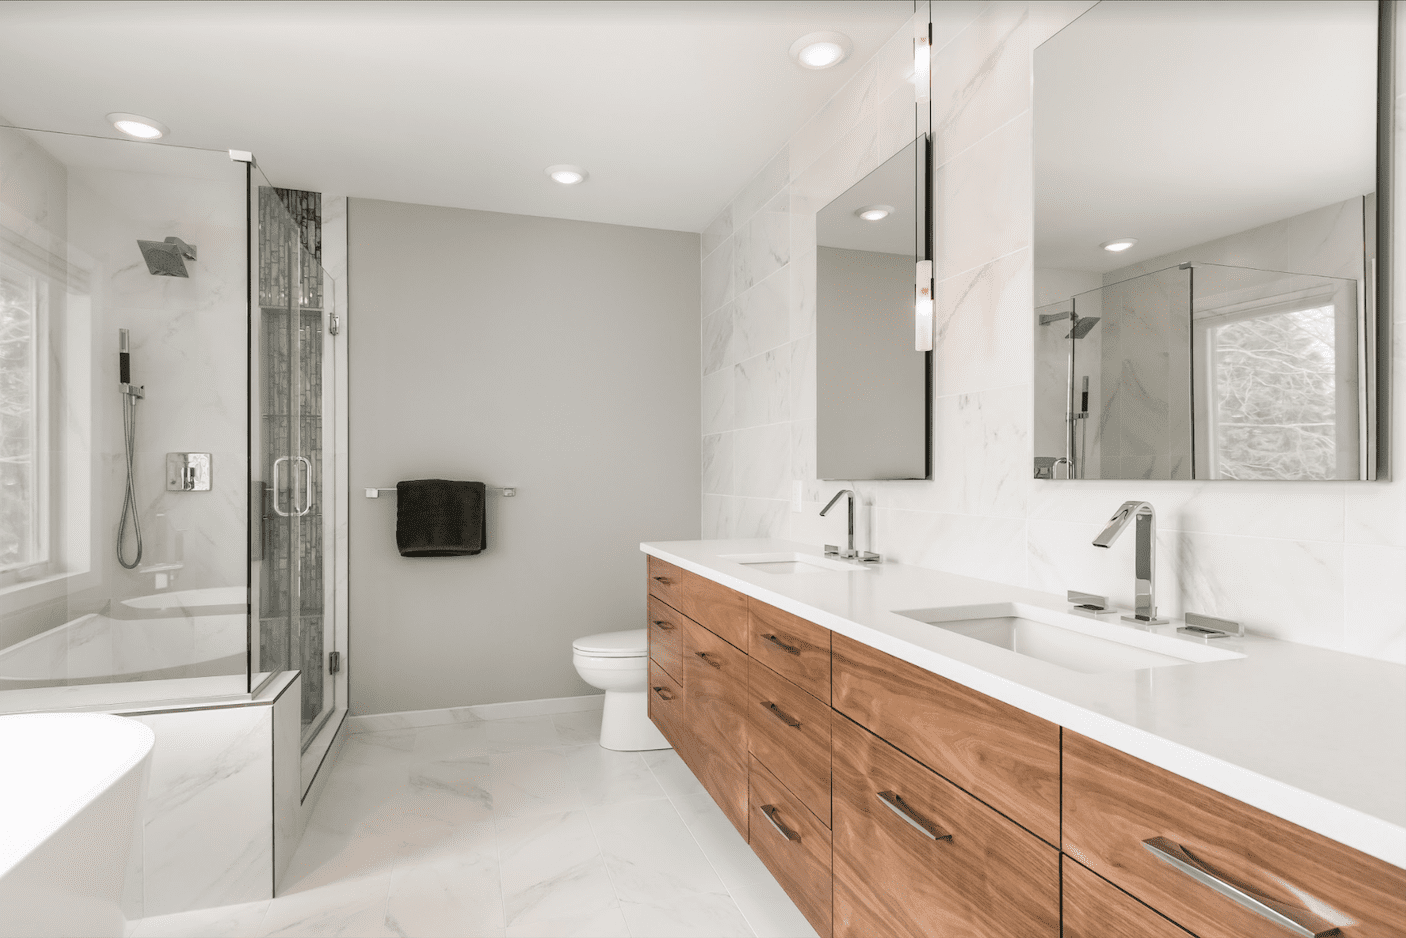 Bathroom Remodeling | FBC Remodel